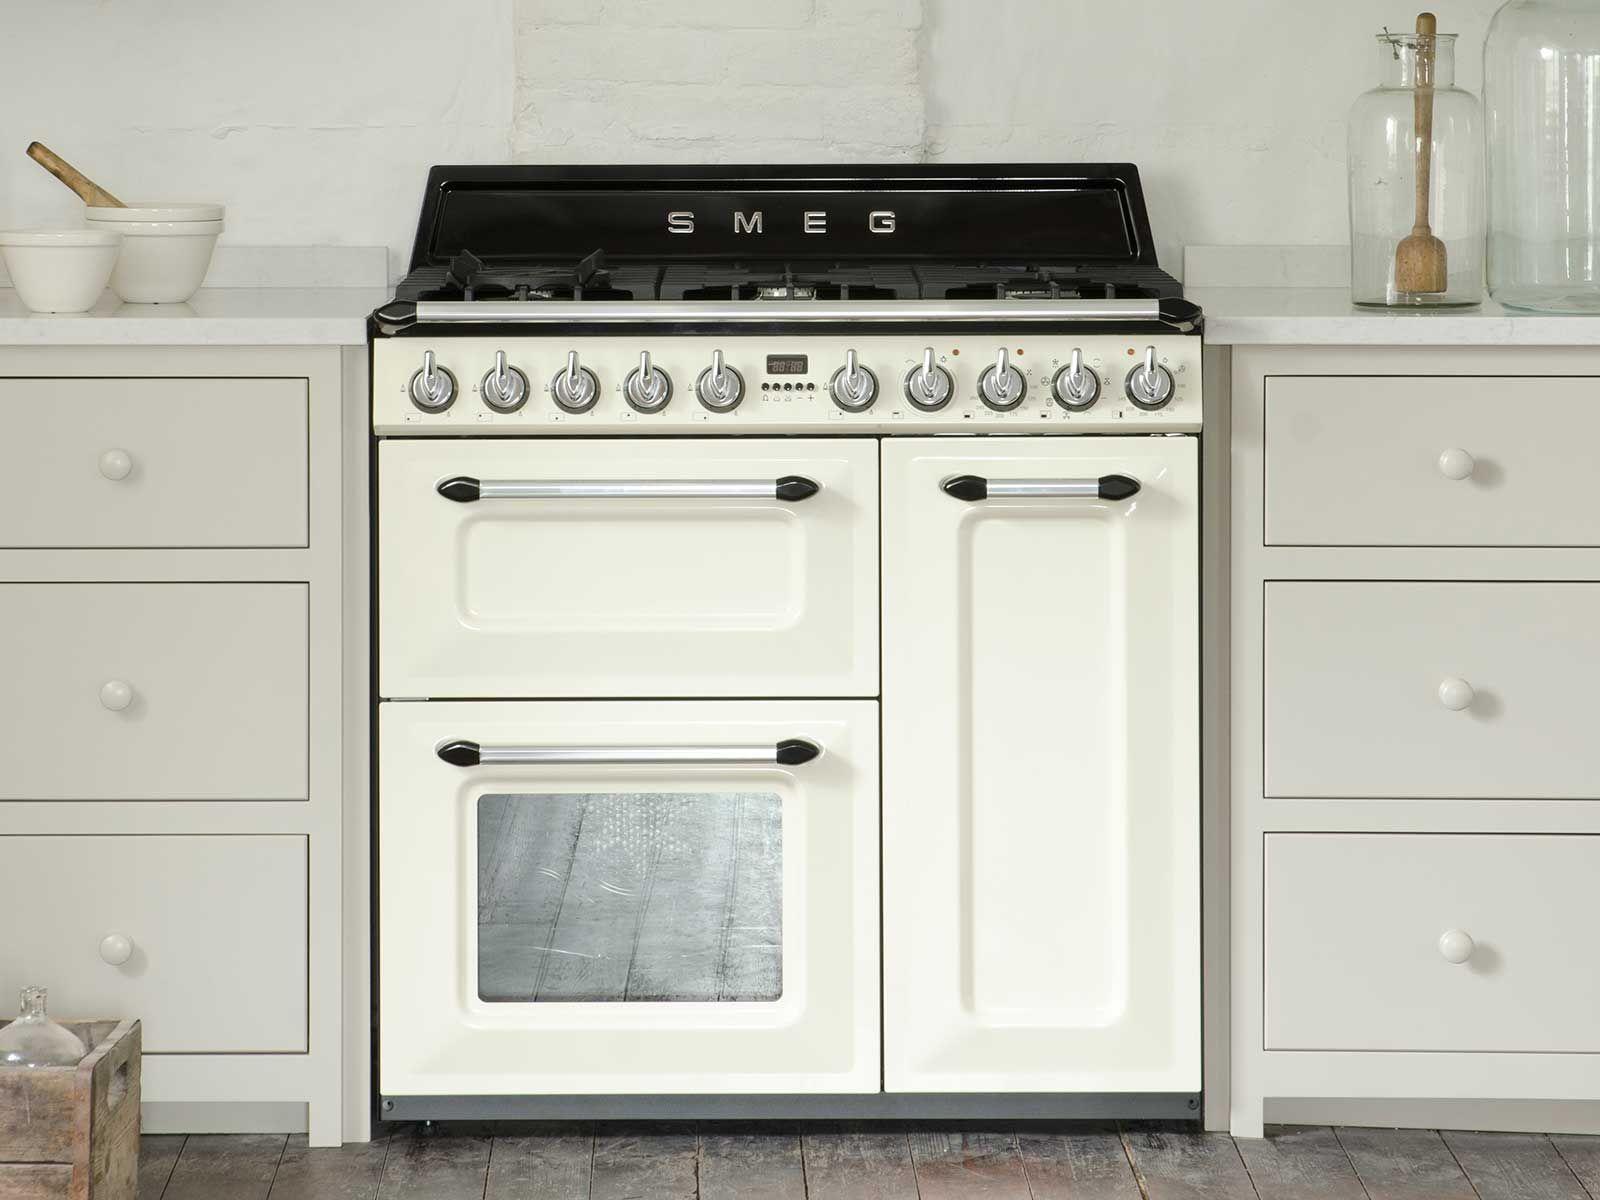 Smeg Kühlschrank Victoria : Image result for gas oven smeg victoria small kitchen pinterest